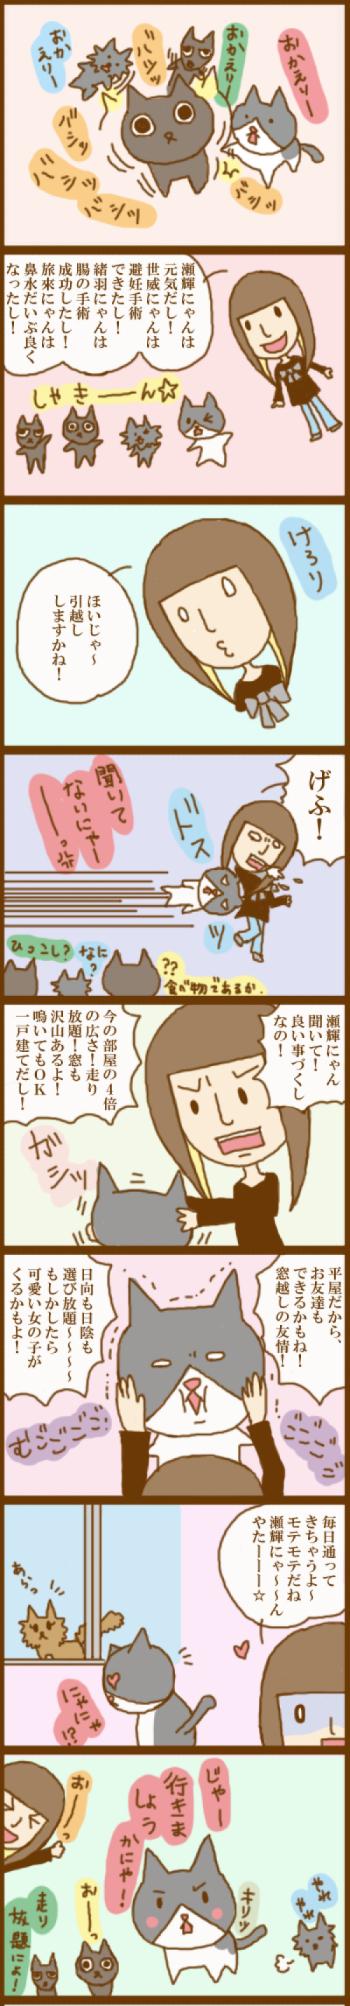 f:id:suzuokayu:20201117092748j:plain